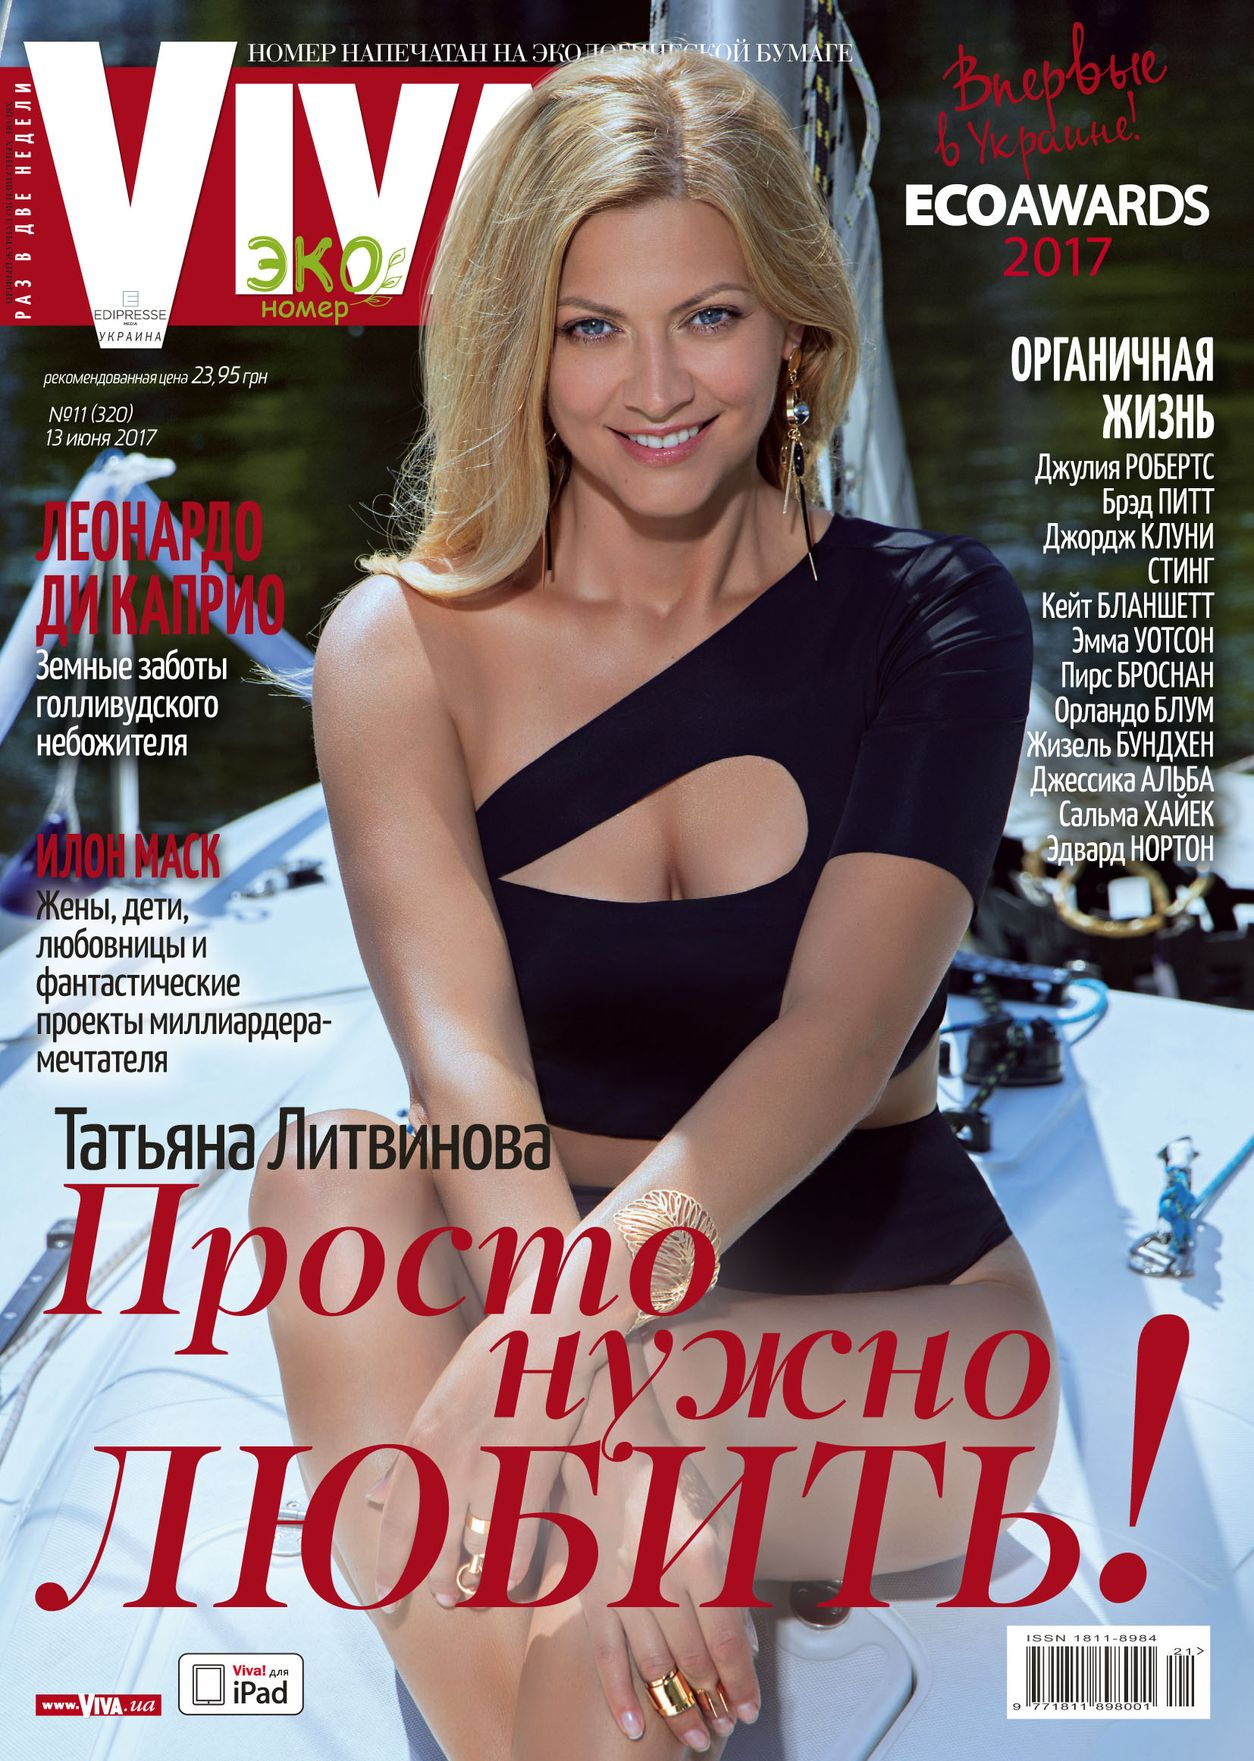 Татьяна Литвинова на обложке Viva!